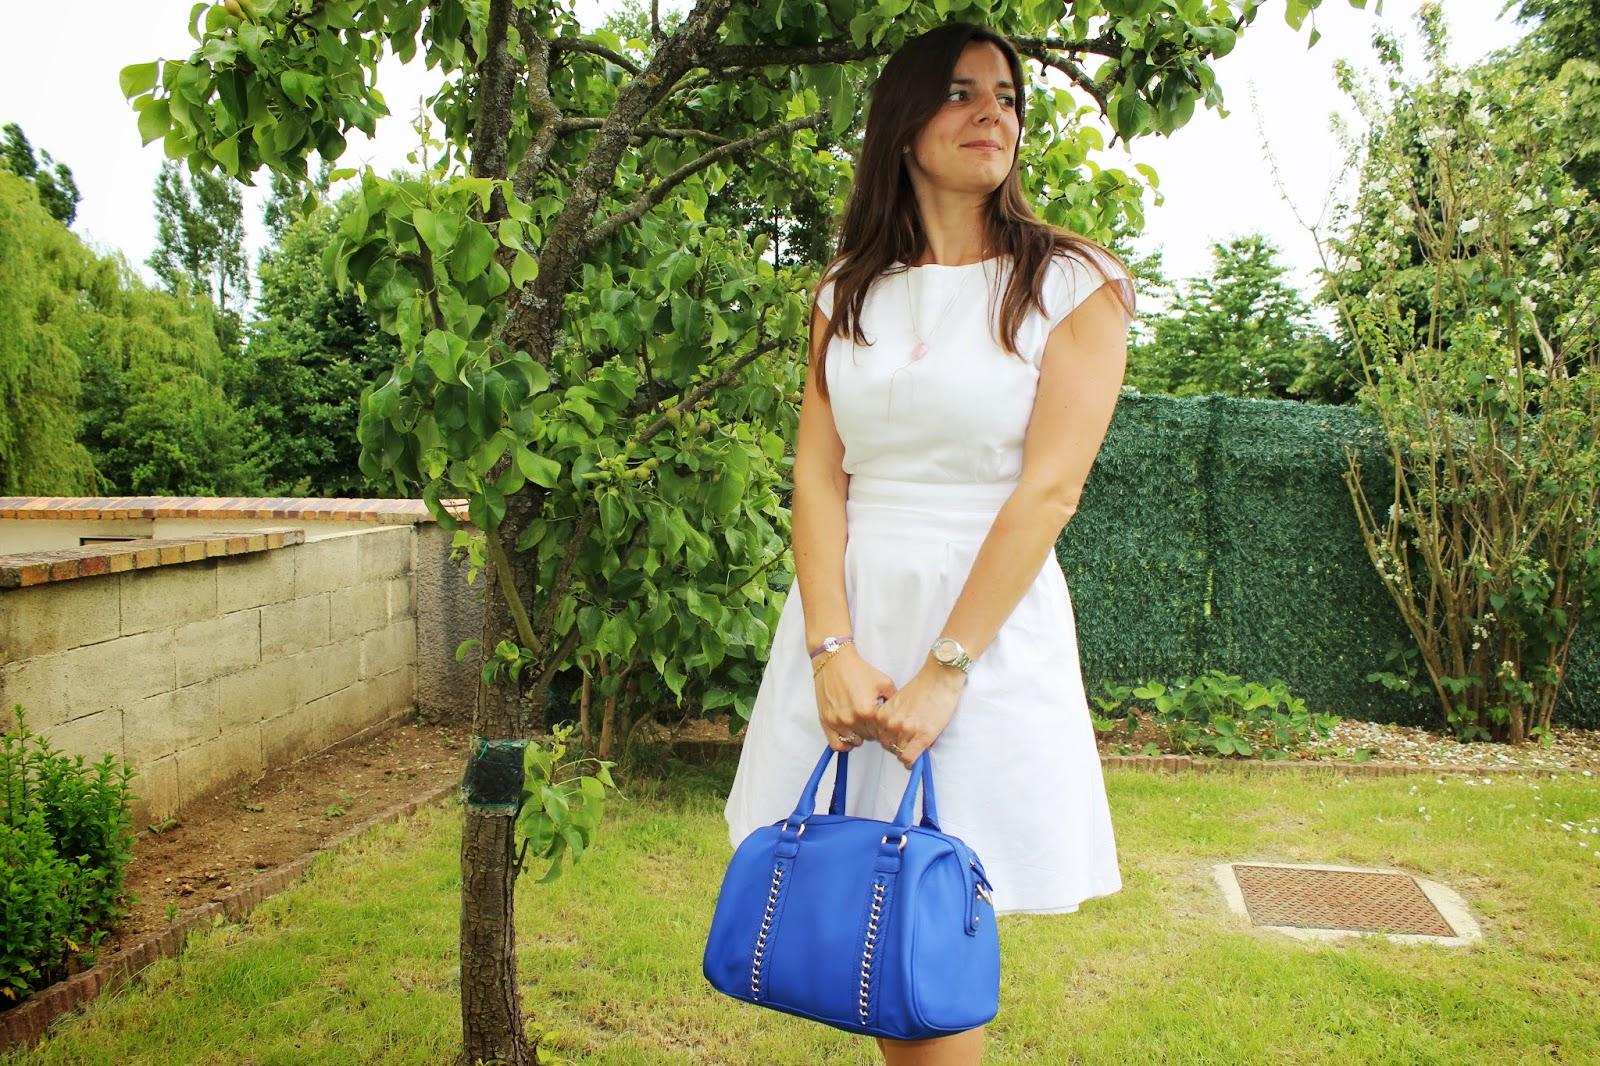 Compensées bleues Naf naf, sac bleue minelli